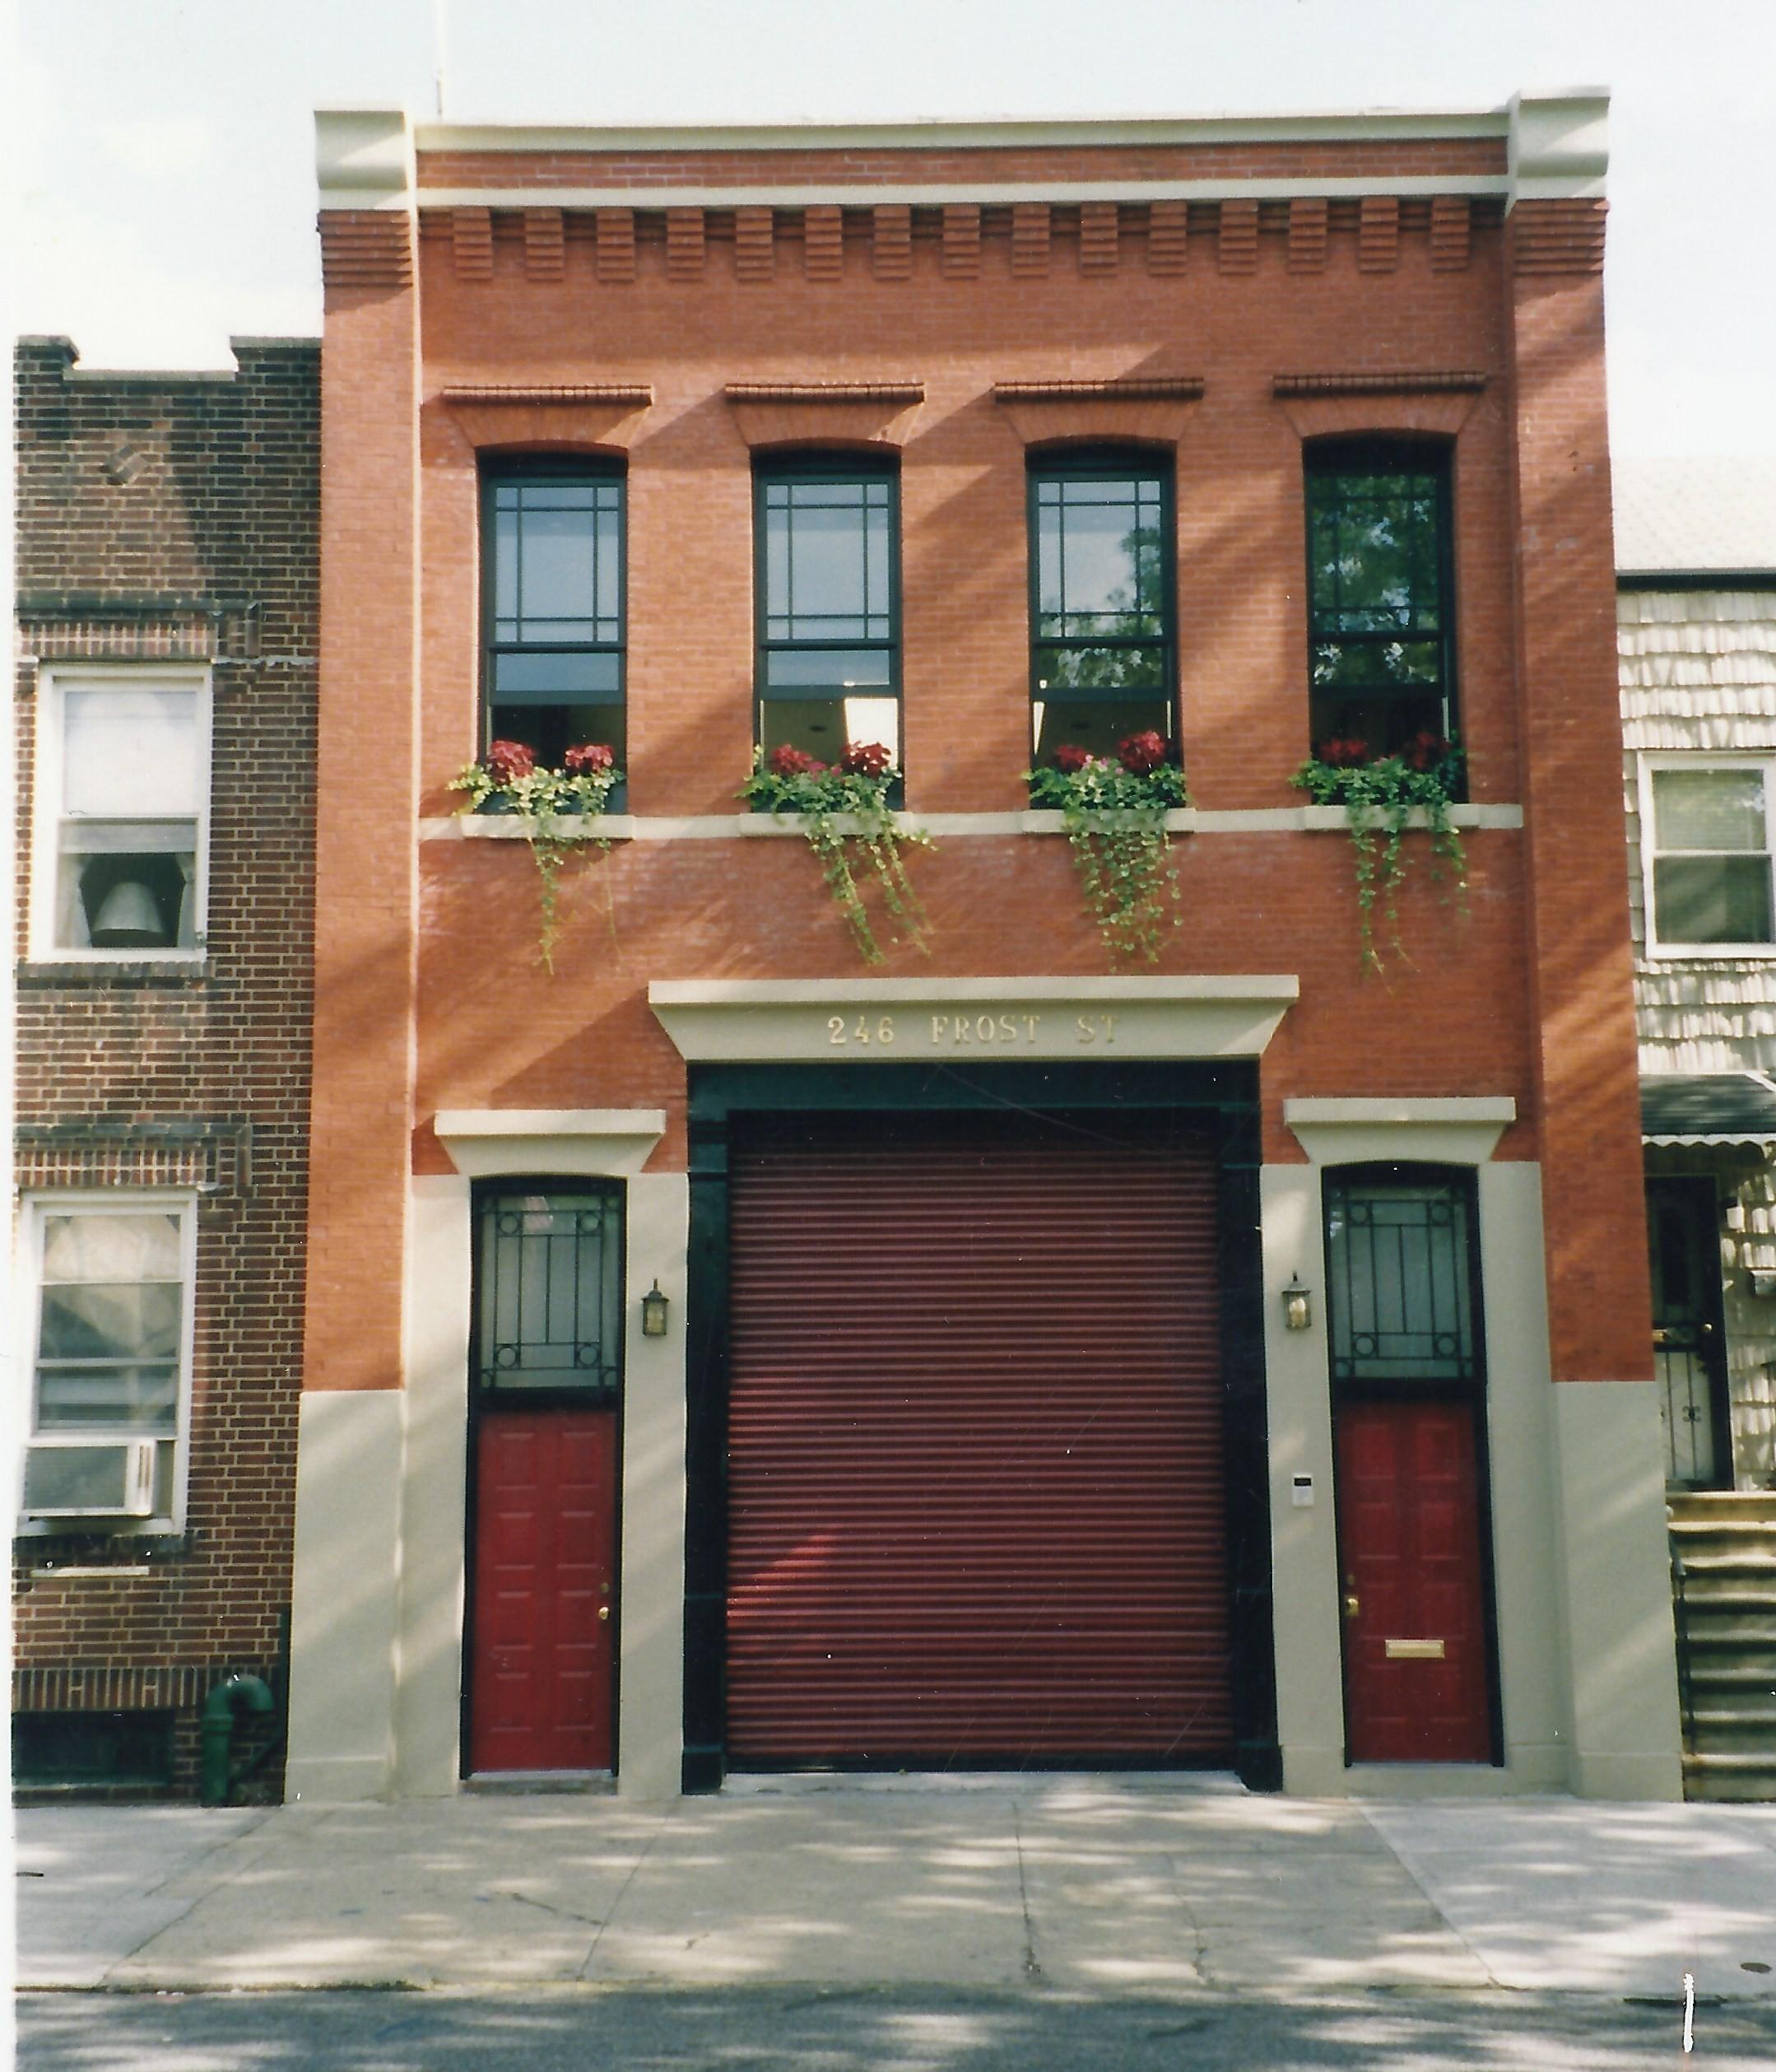 246 Frost Street, Williamsburg, firehouse,